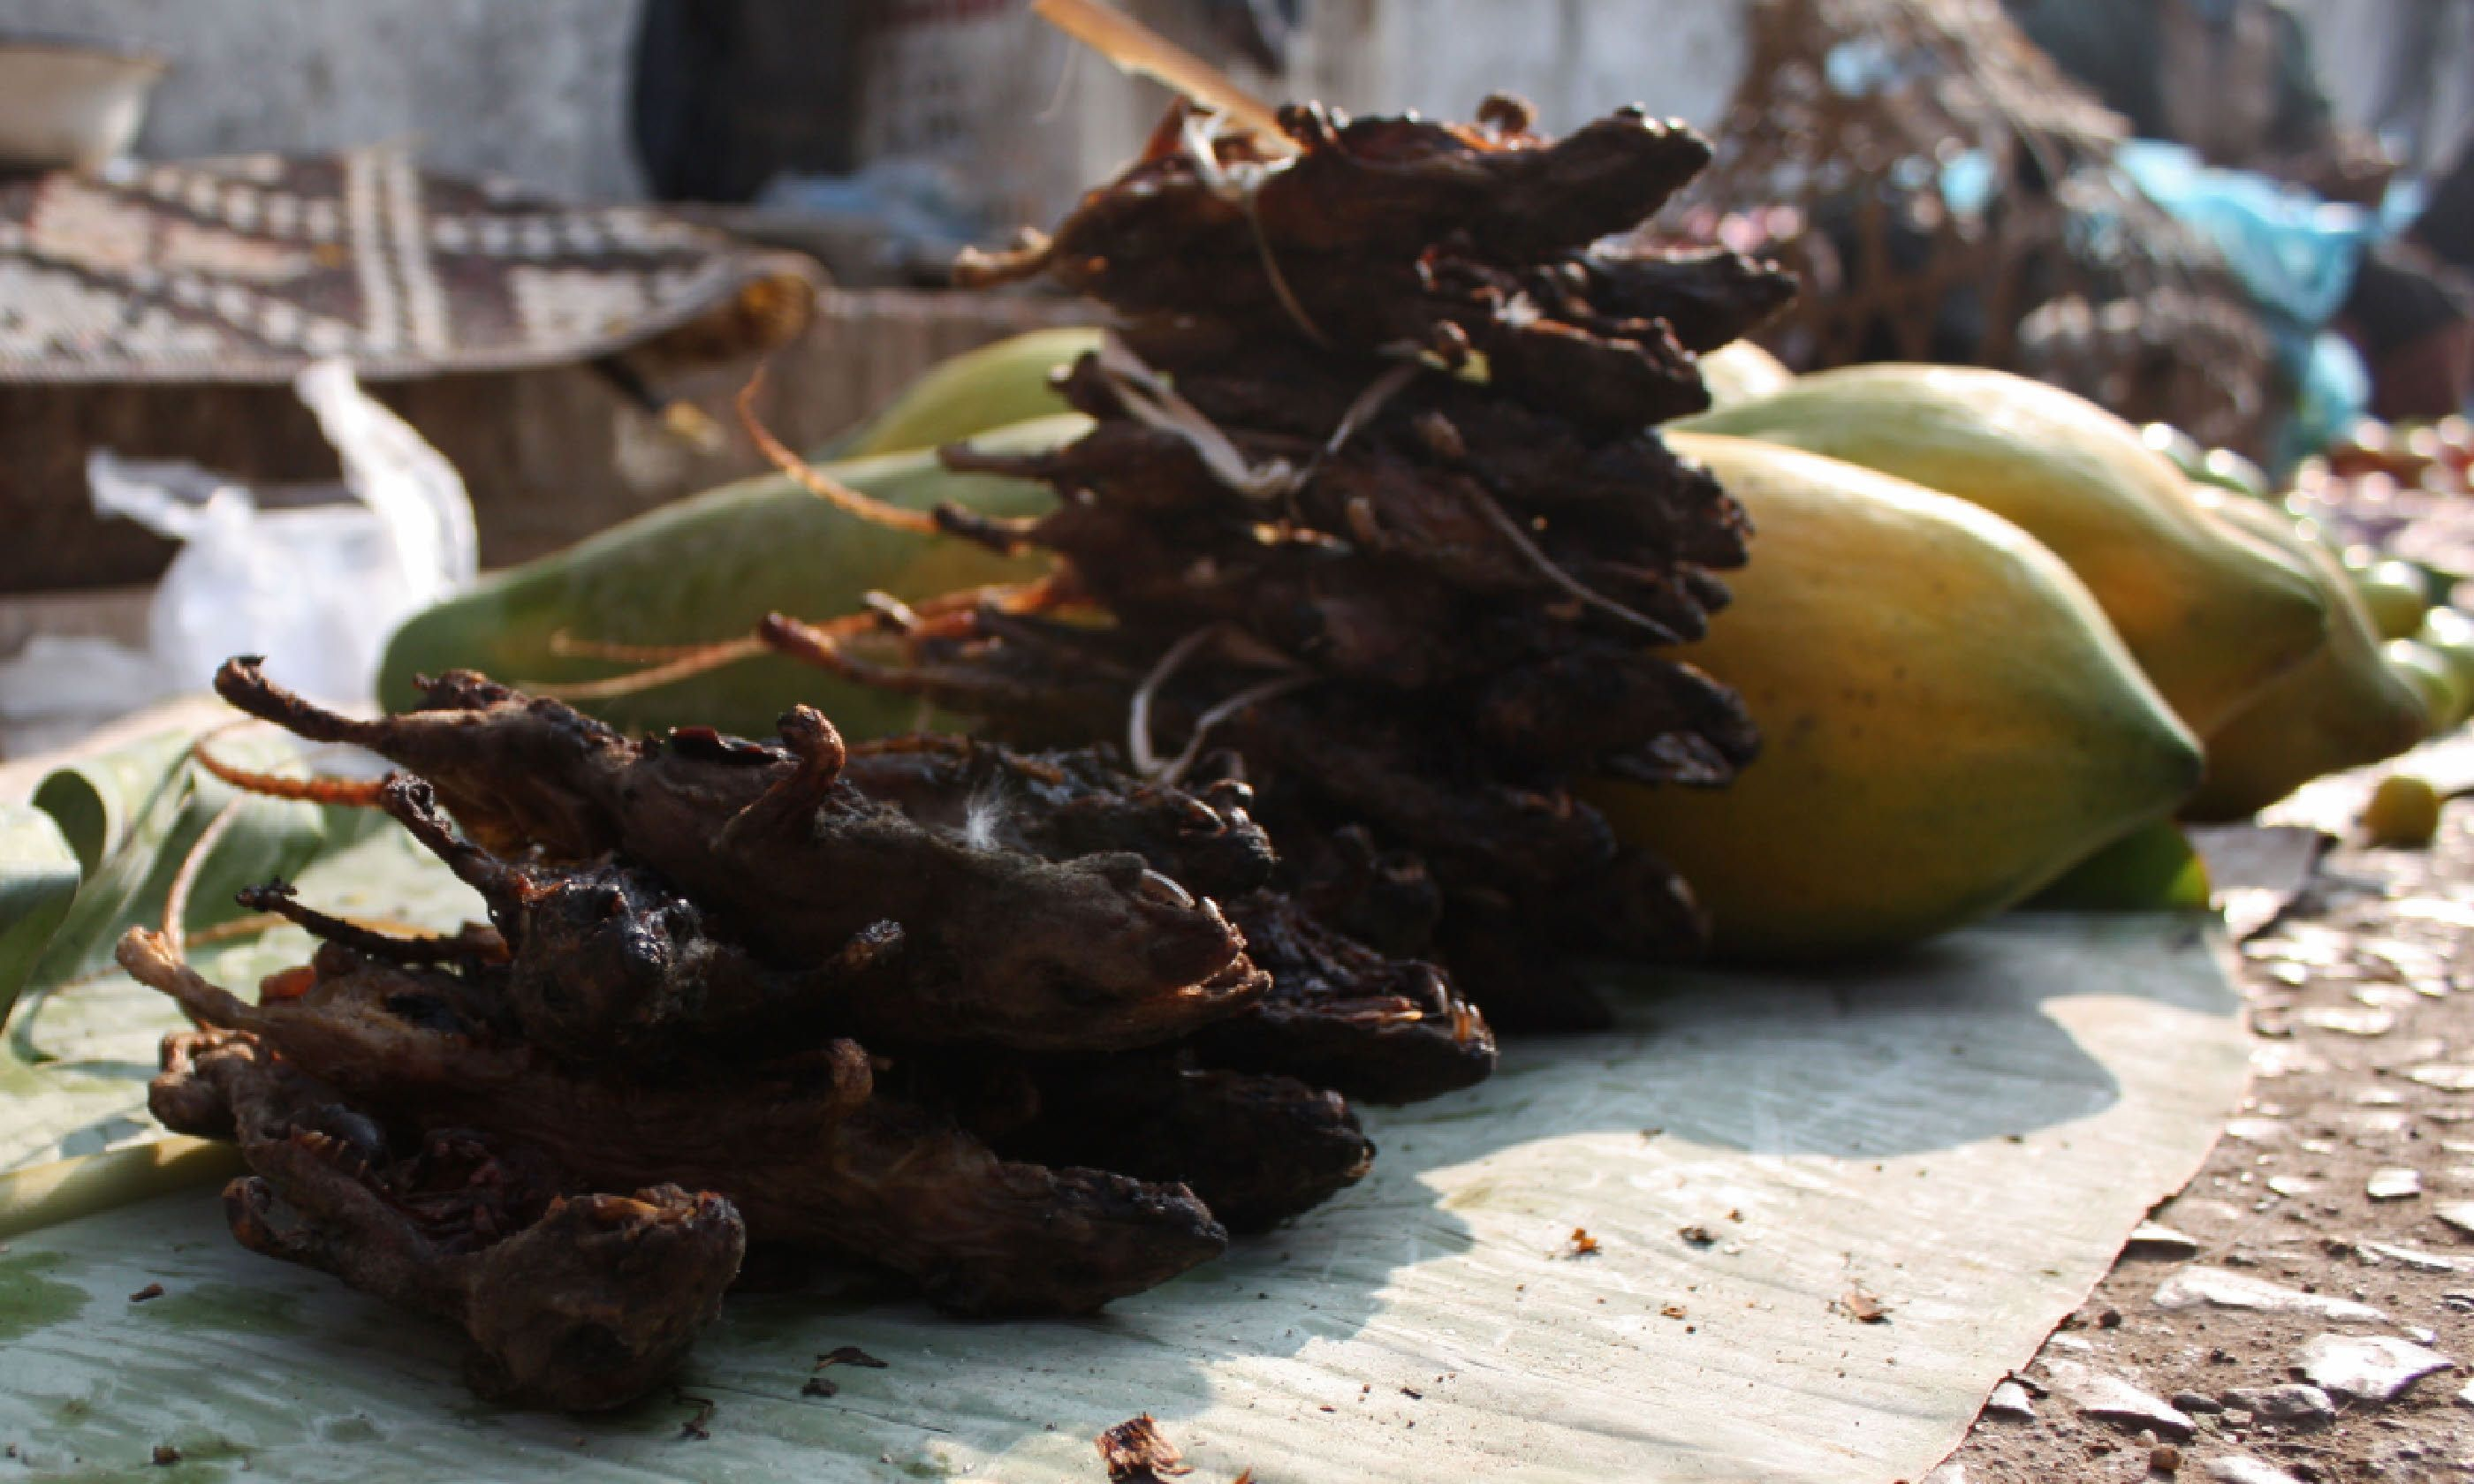 Rat snack (Flickr C/C: istolethetv)